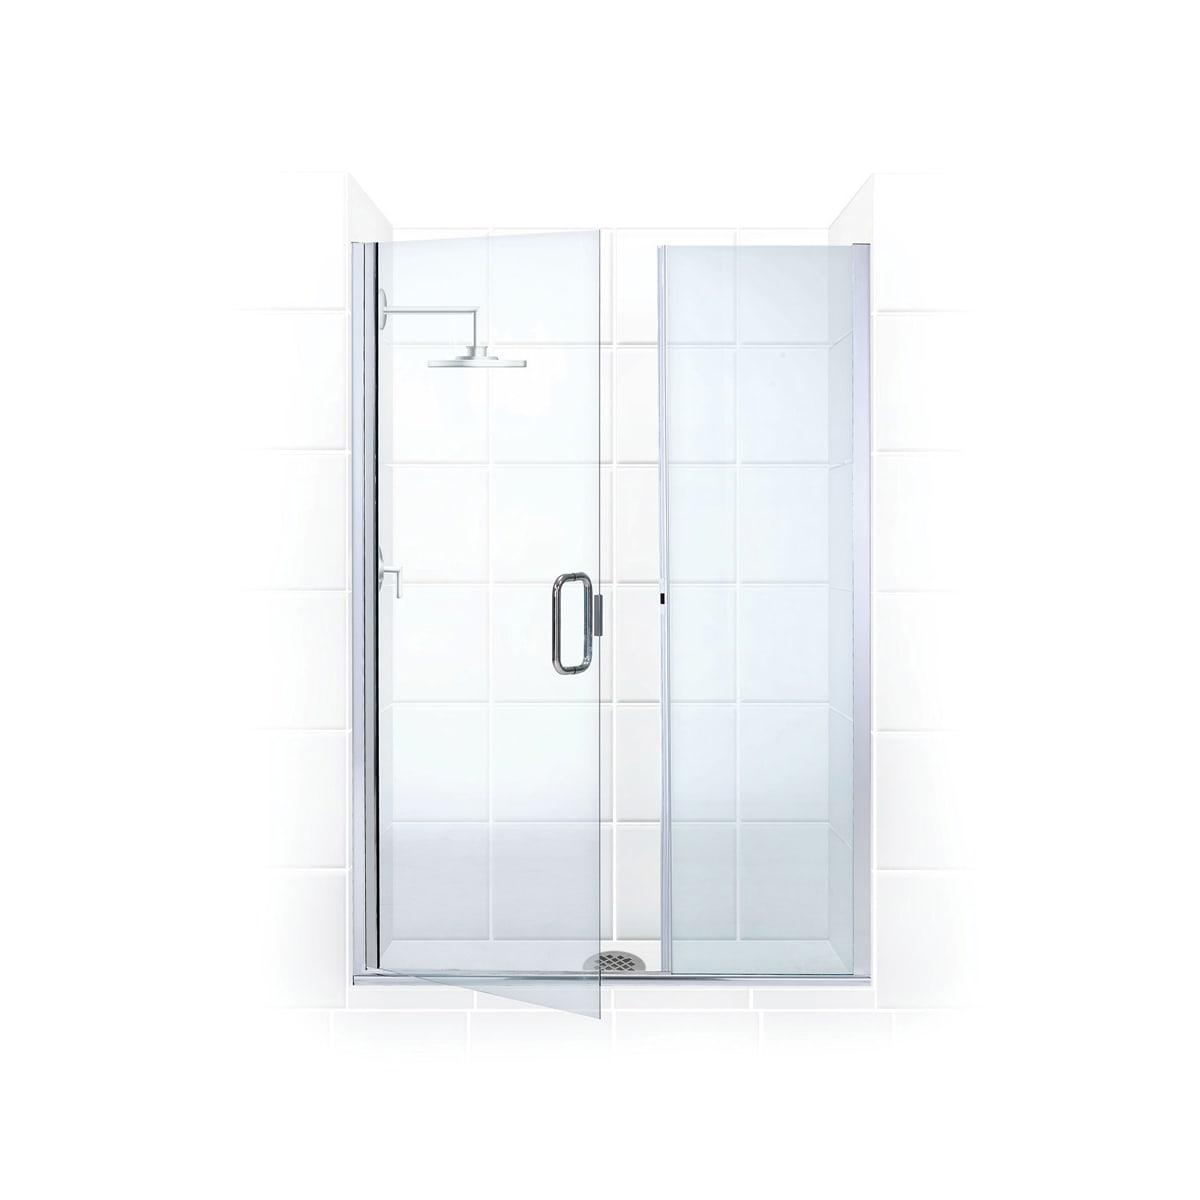 Coastal Shower Doors Hc55il 70 C